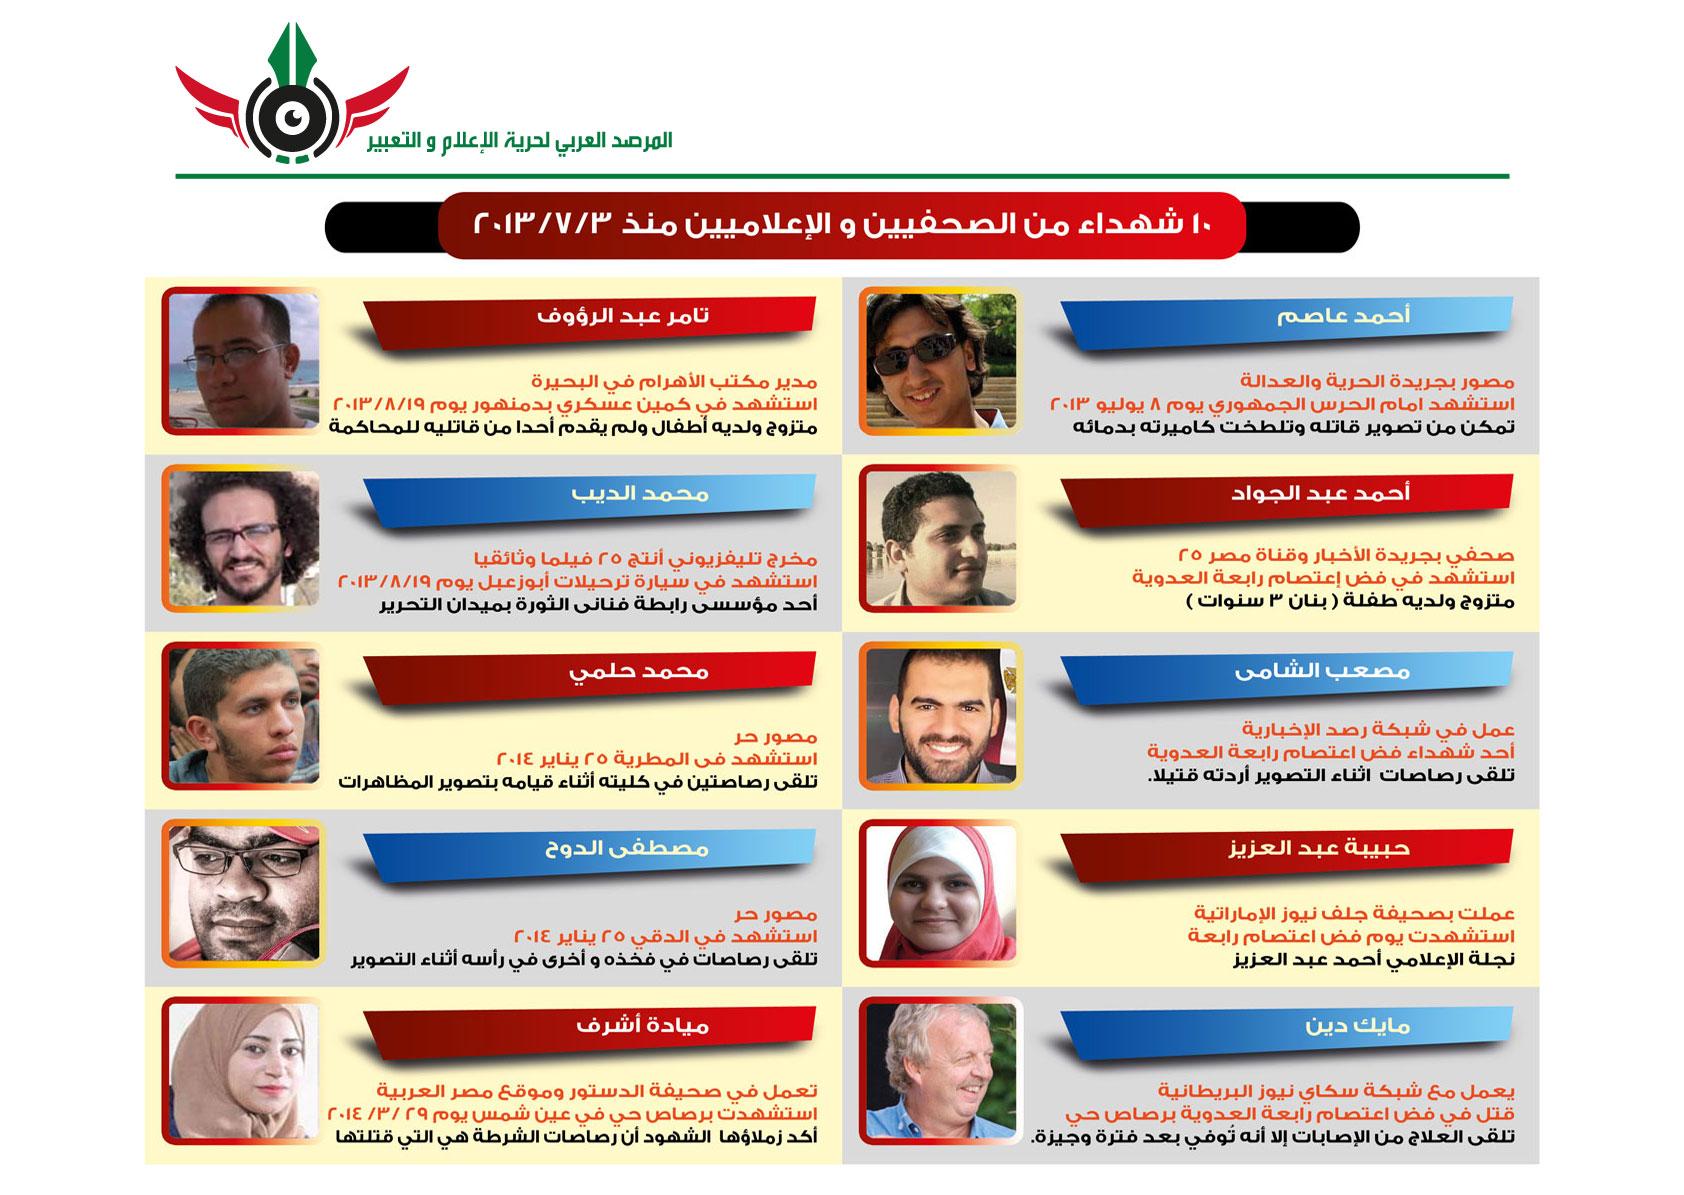 2c168ce6c التقرير الاول: أحزان صاحبة الجلالة..عام من القتل والمطاردة والإغلاق -  المرصد العربي لحرية الإعلام